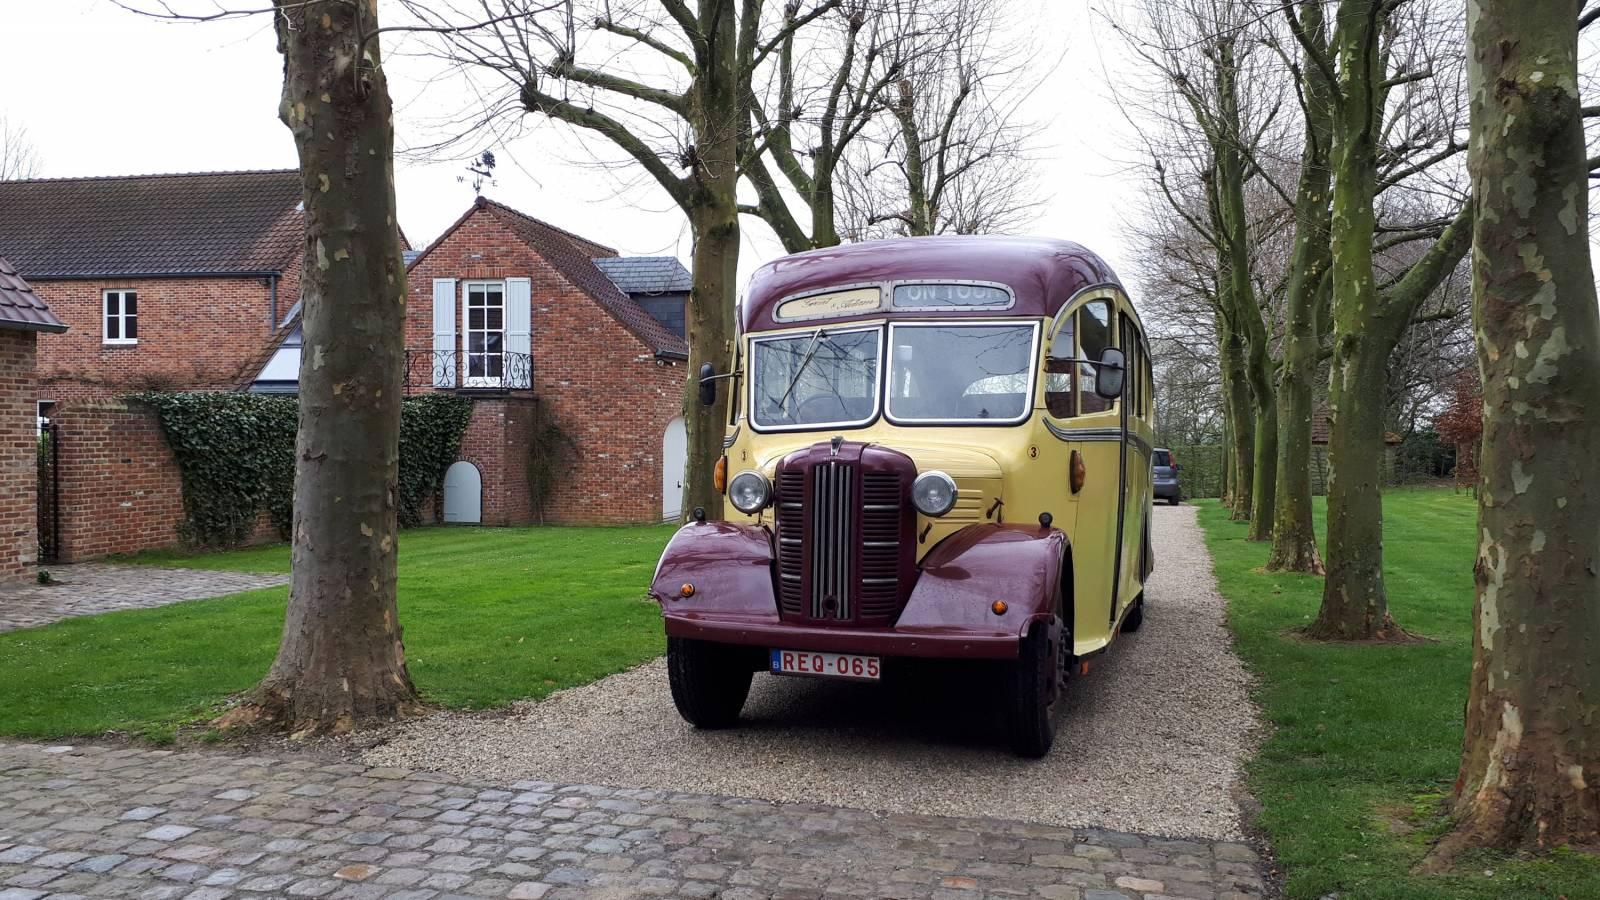 The London Ceremony Bus - Trouwvervoer - Ceremonievervoer - Bus - House of Weddings - 8